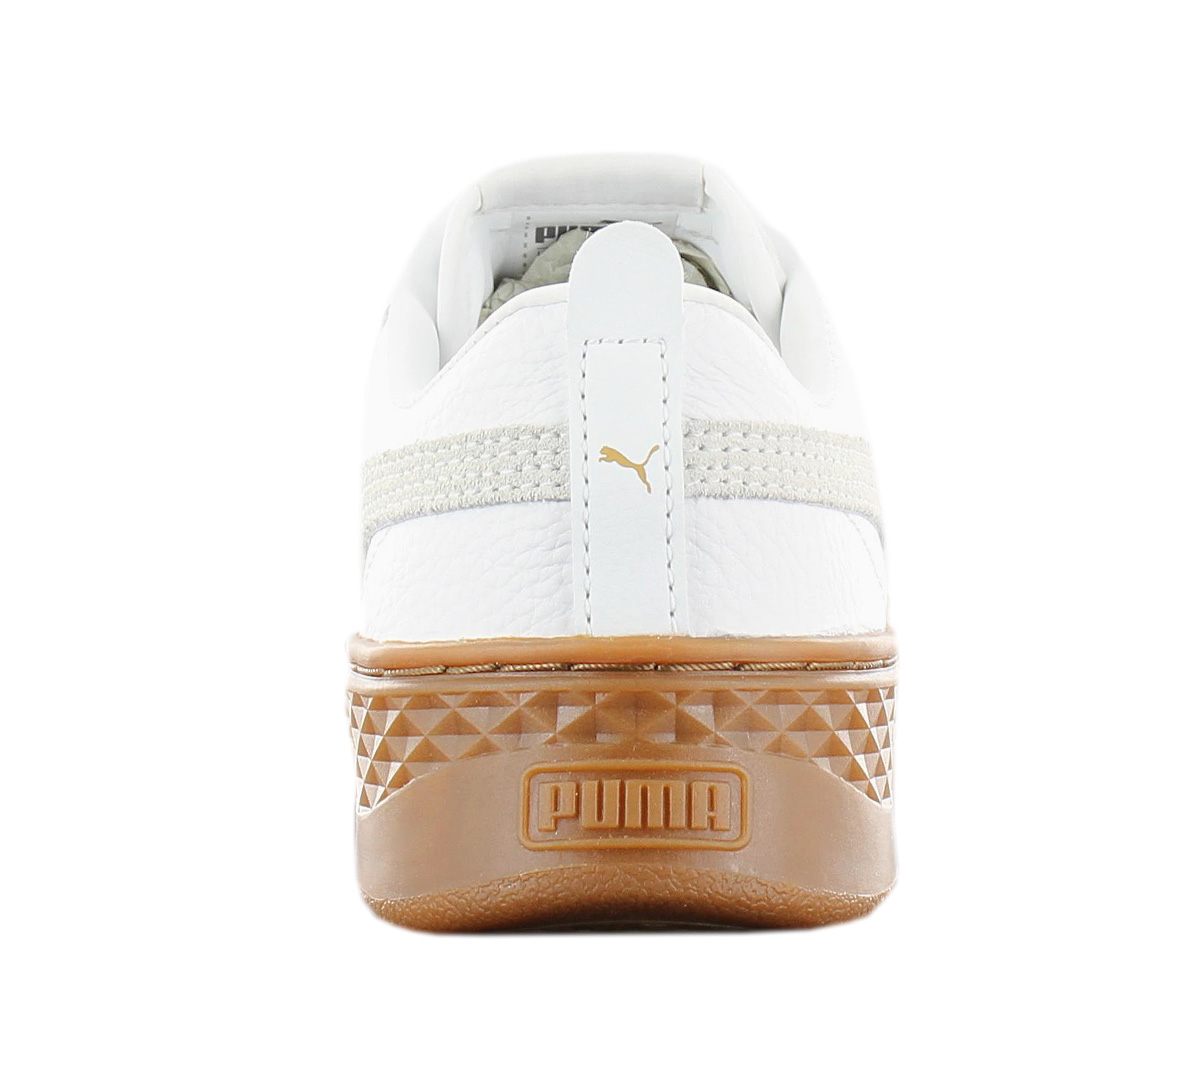 61e510119f0845 Puma Smash Platform L Leather Sneaker Ladies Shoes White 366487-02 ...